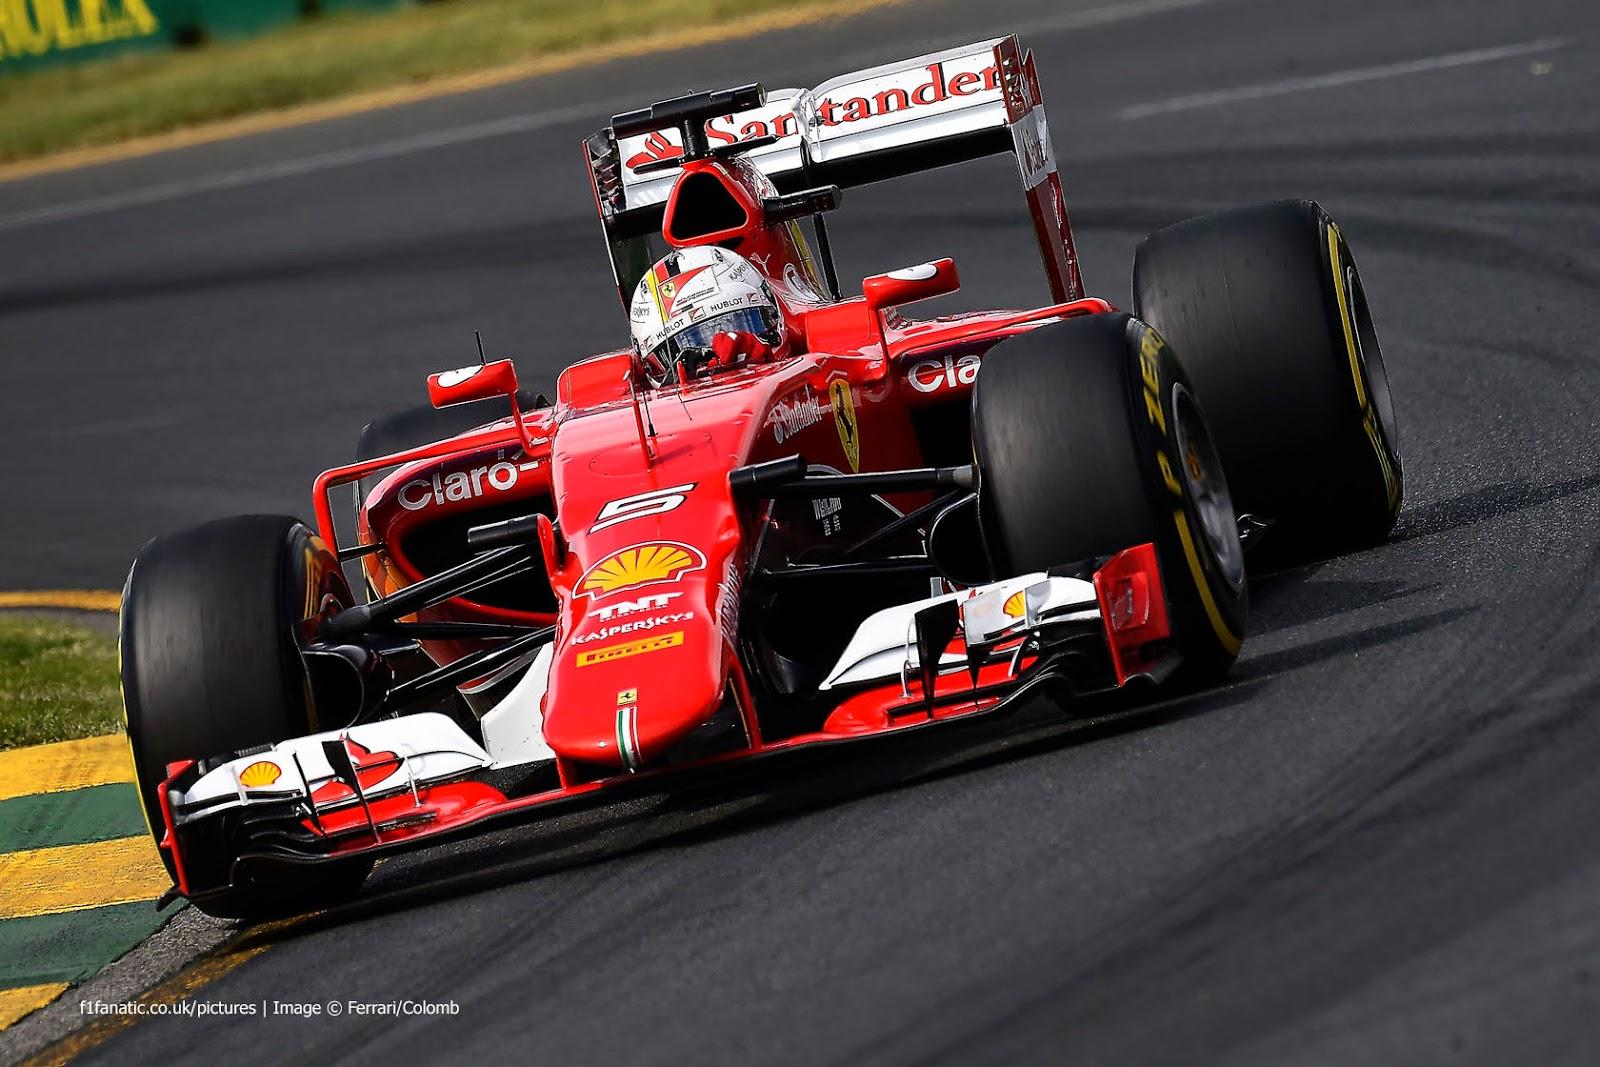 Tapeta F1 Ferrari Kimi Raikkonen 1600x1067 Download Hd Wallpaper Wallpapertip